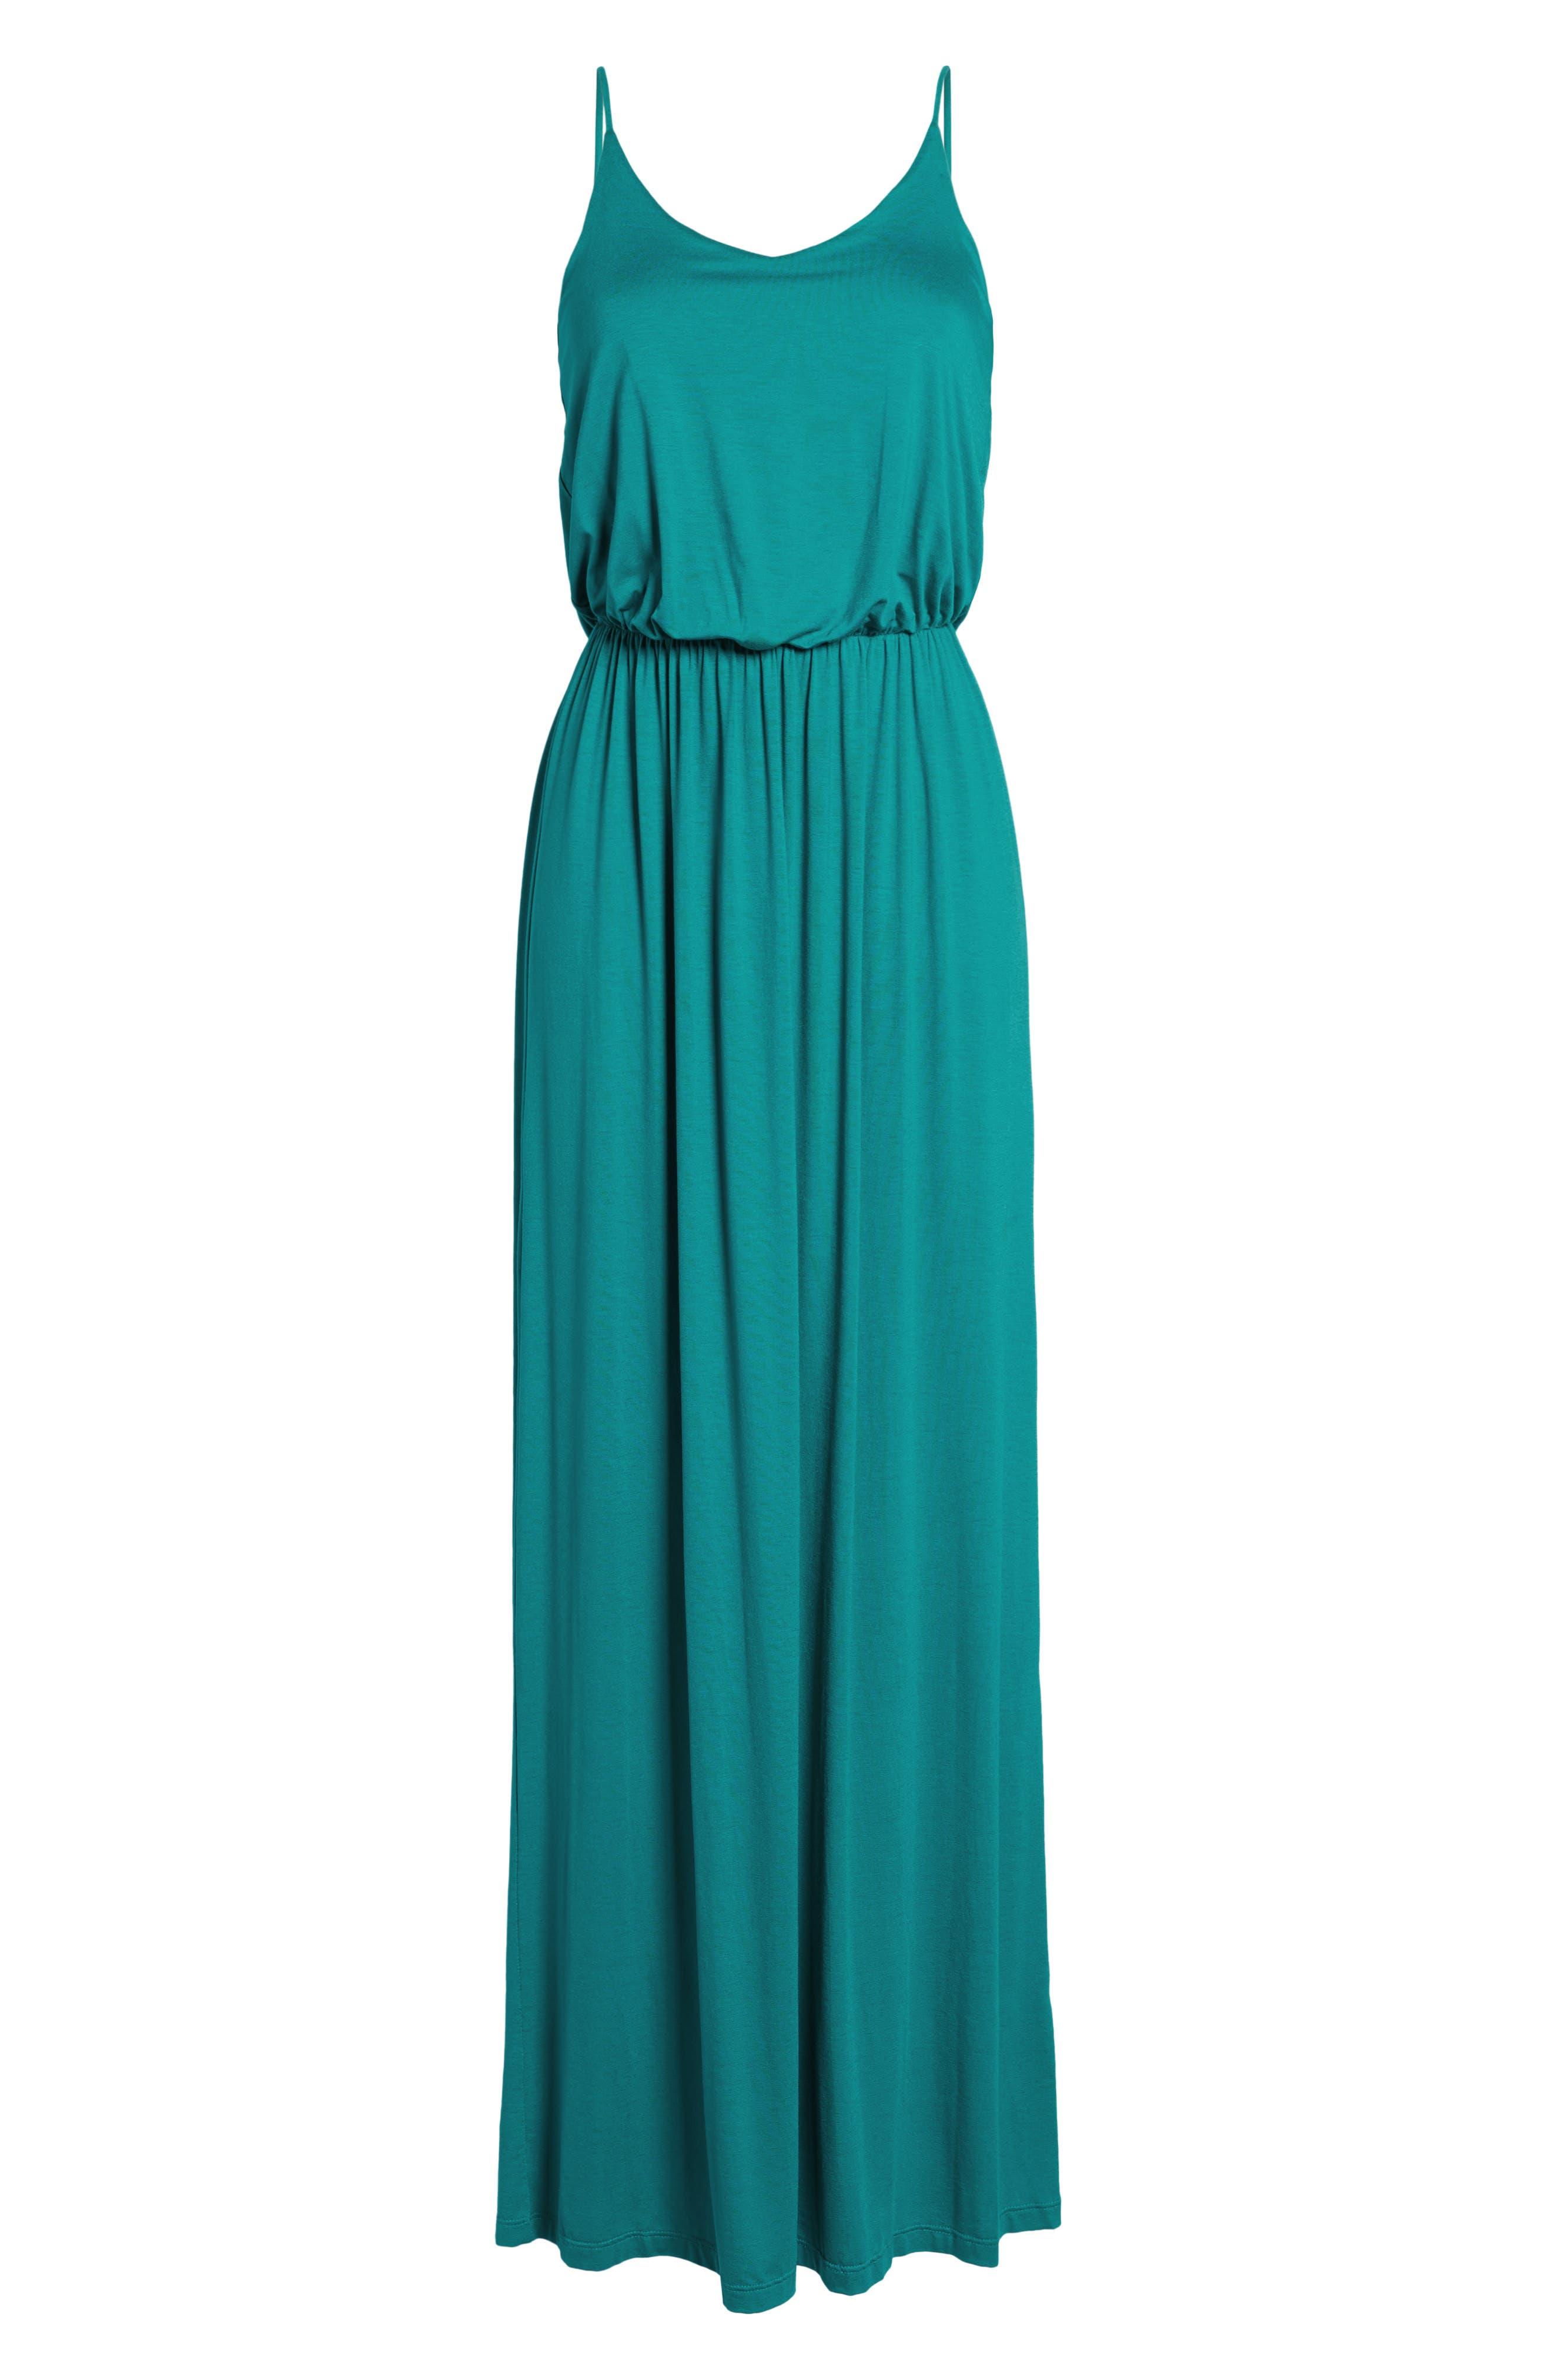 Main Image - Knit Maxi Dress